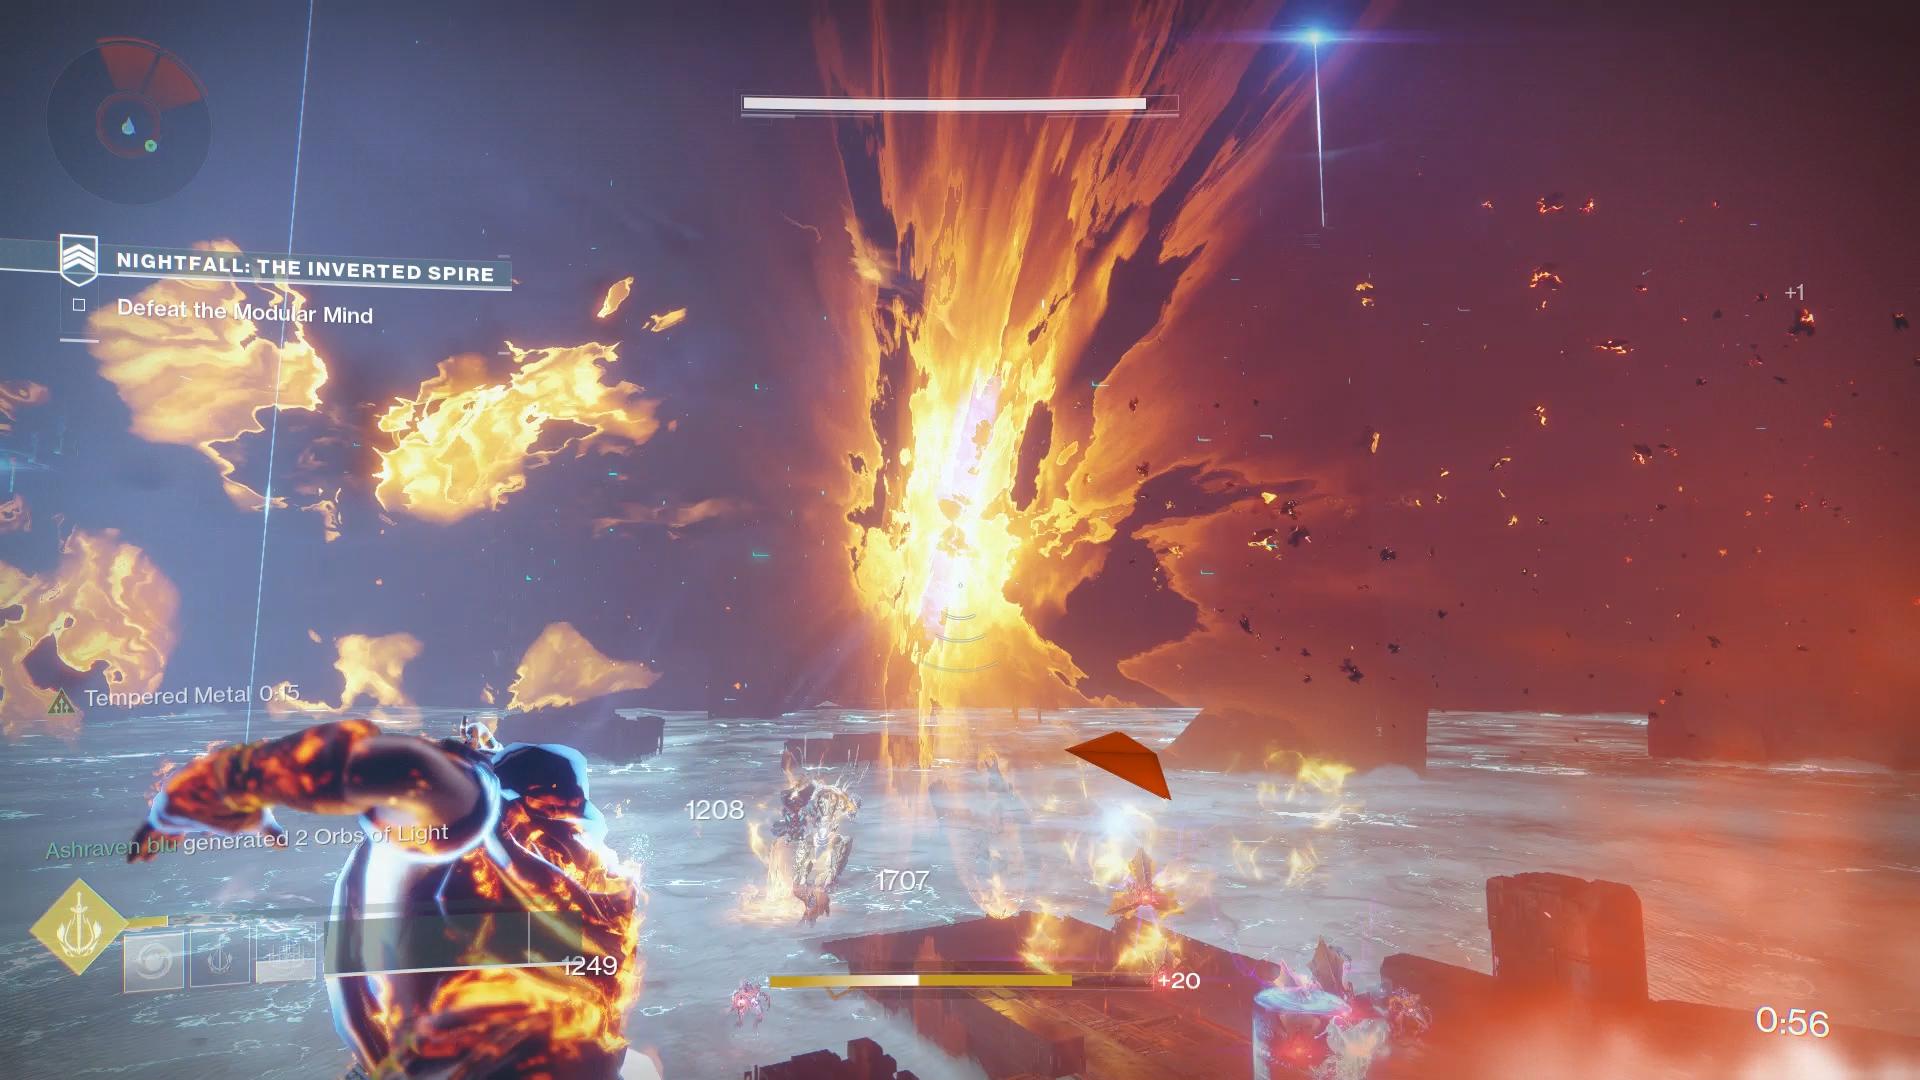 Destiny 2 - The Inverted Spire Nightfall Guide | Shacknews